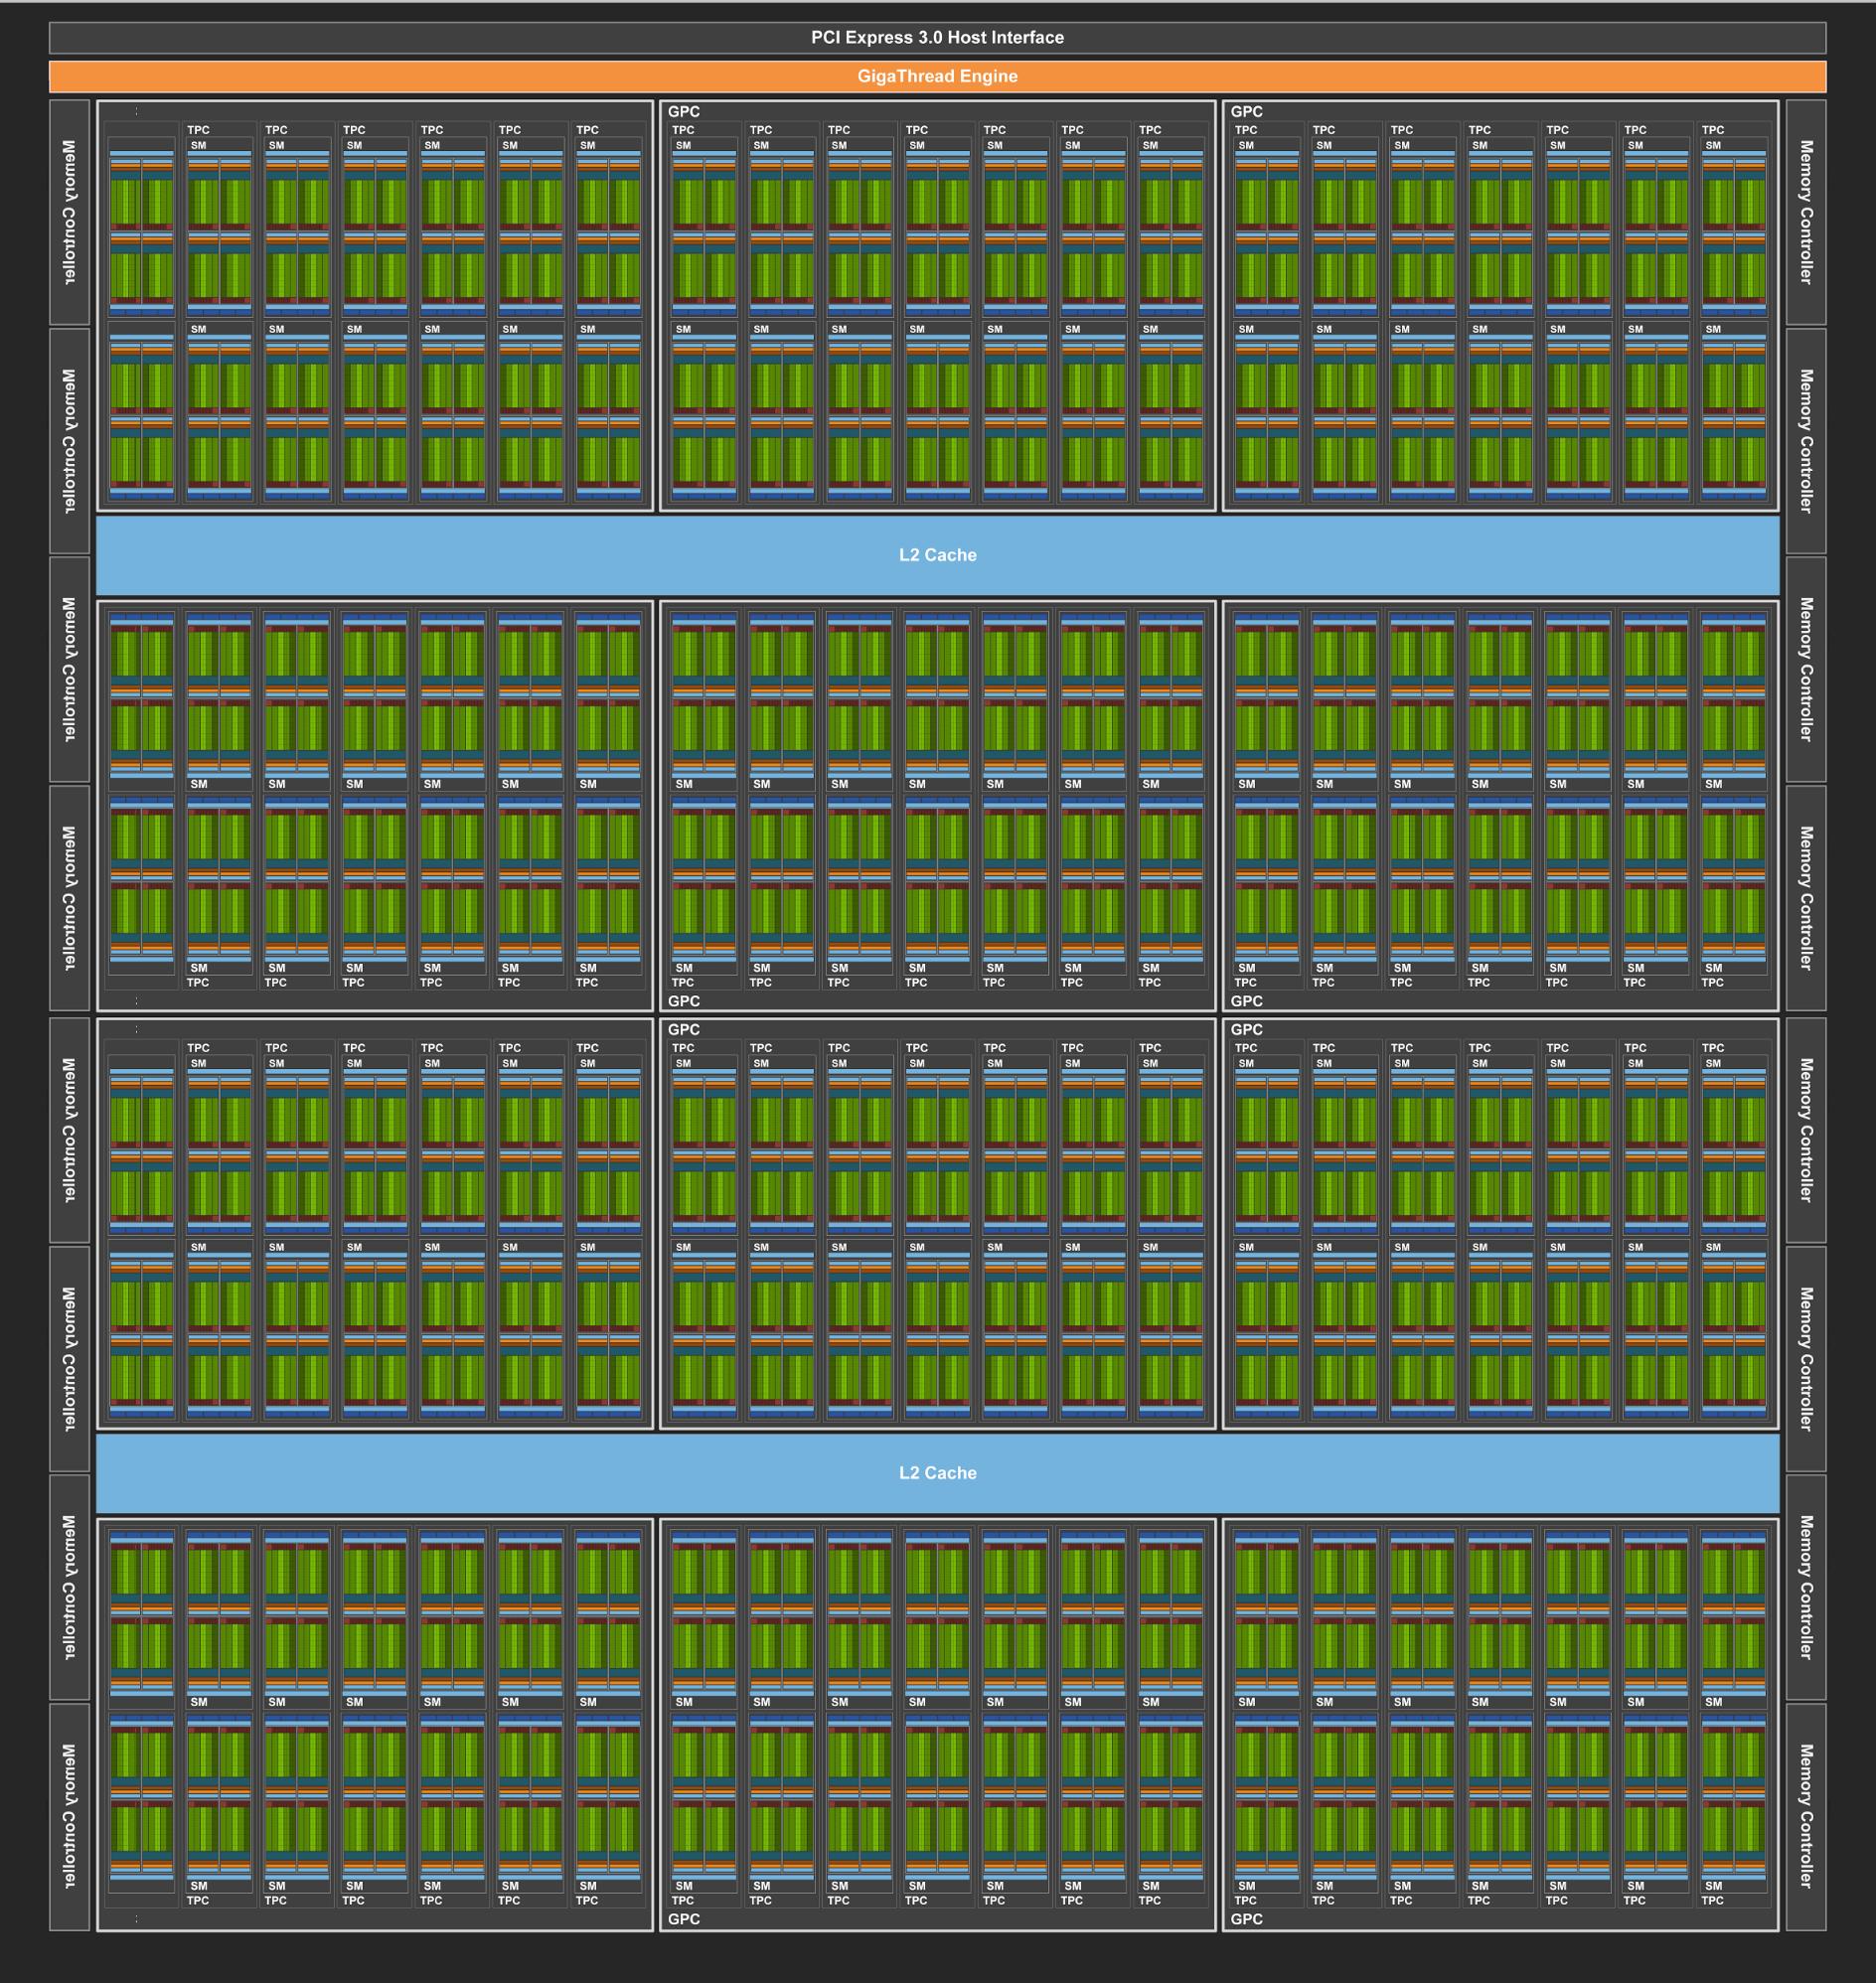 NVIDIA GTX 1180 Ti Specs & Benchmarks Leaked - 10752 CUDA Cores